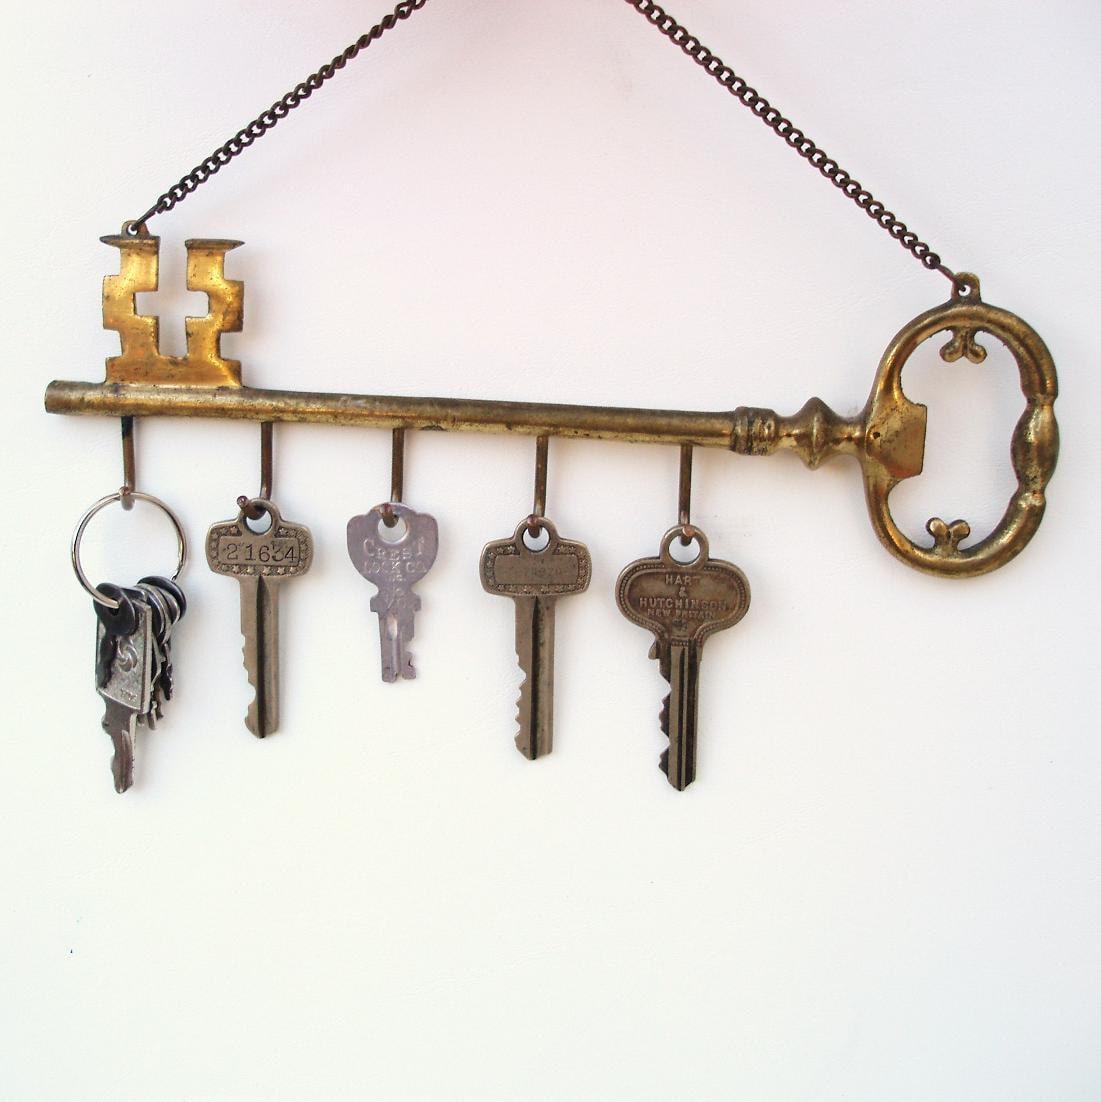 Vintage Wall Hanging Key Rack Brass Key Holder Large Skeleton